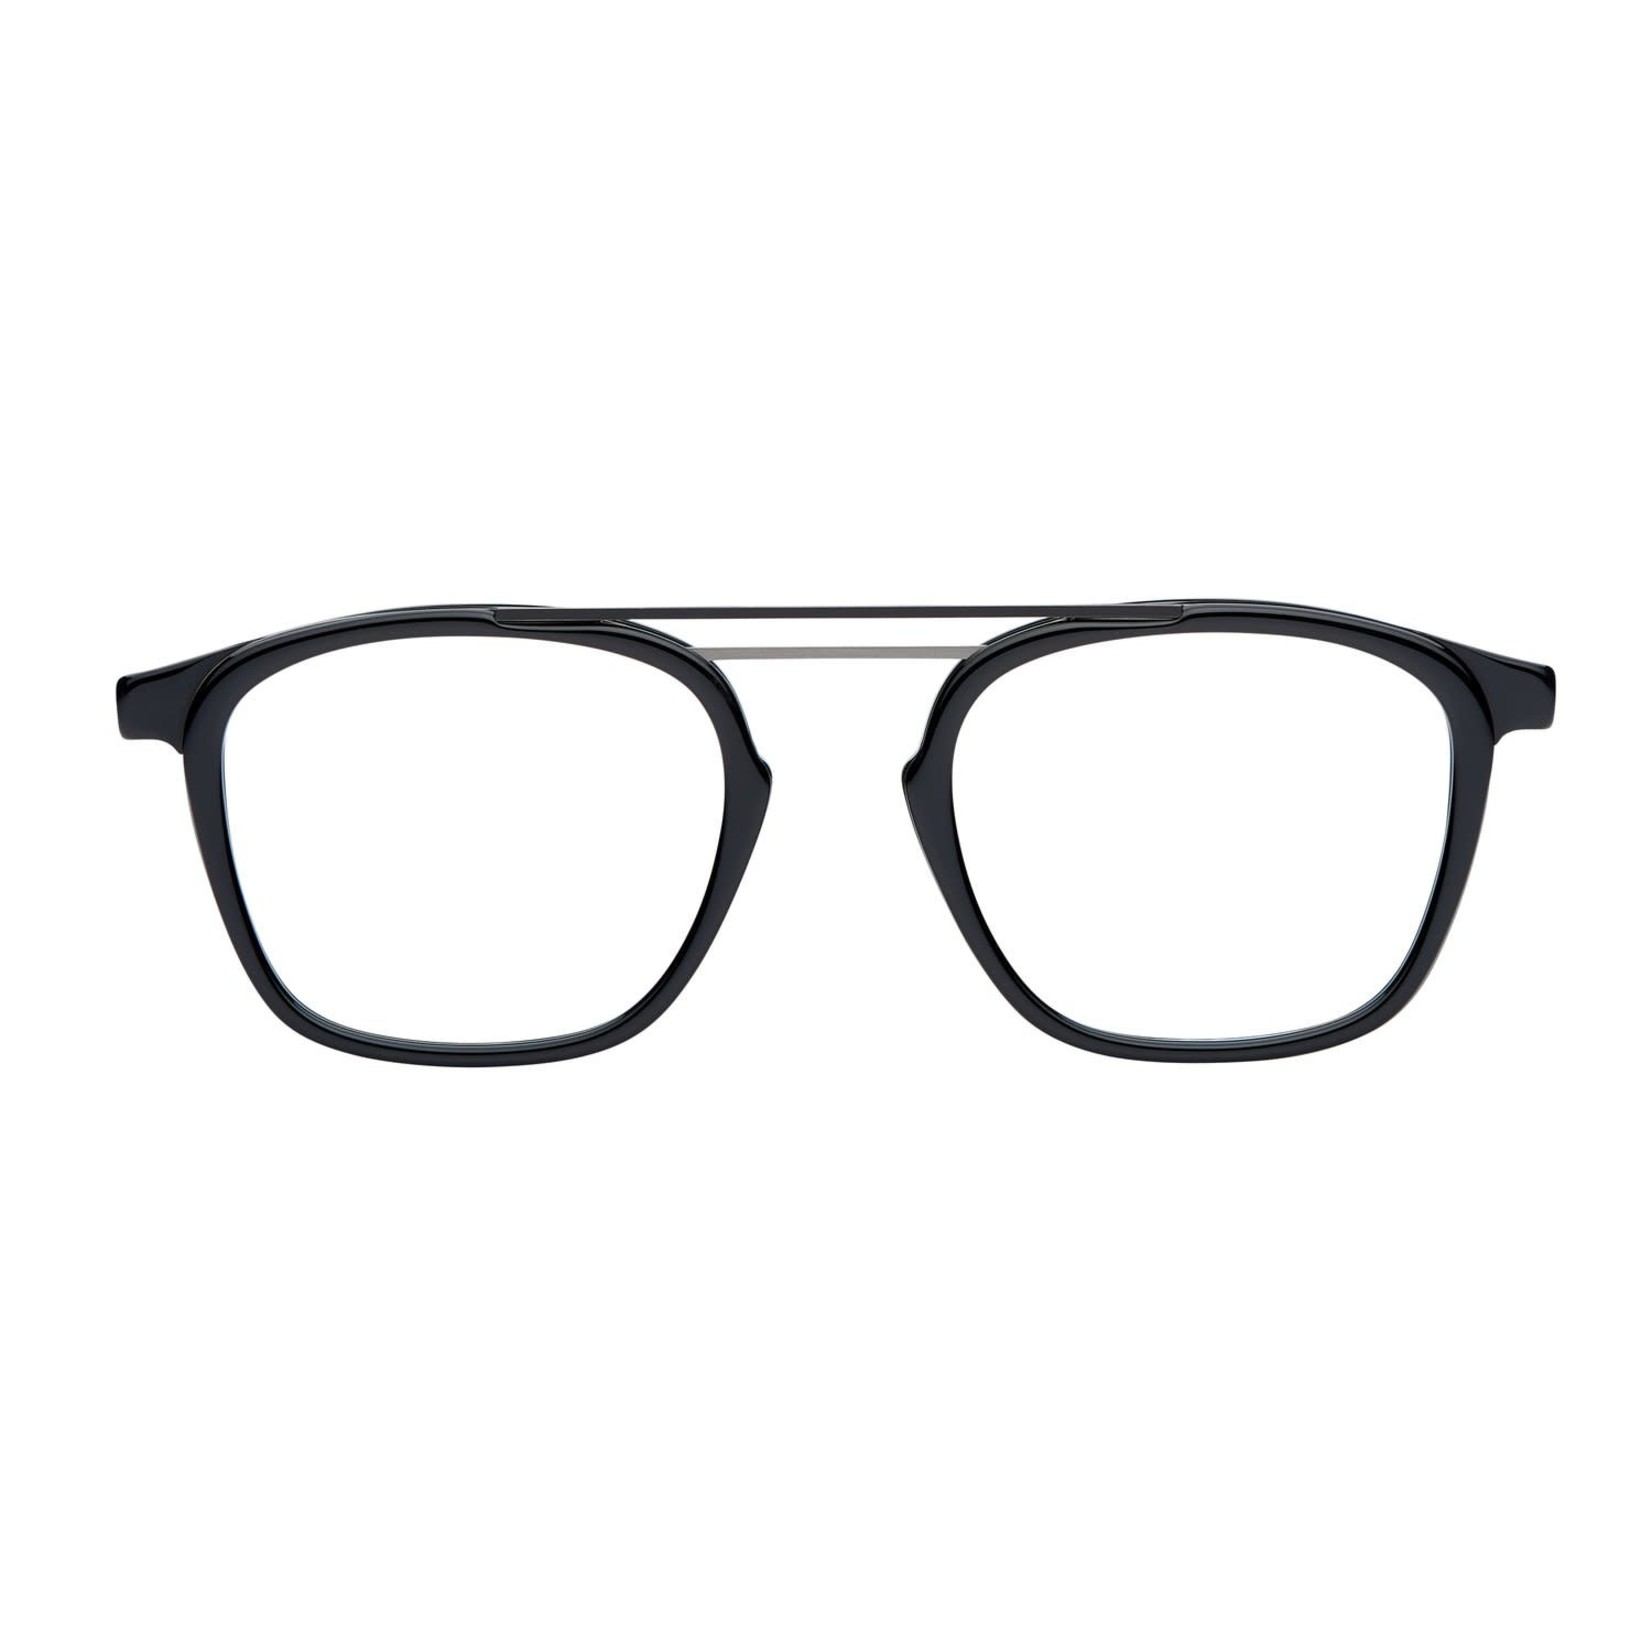 La Petite Lunette Eyewear LPLR Vilchamet